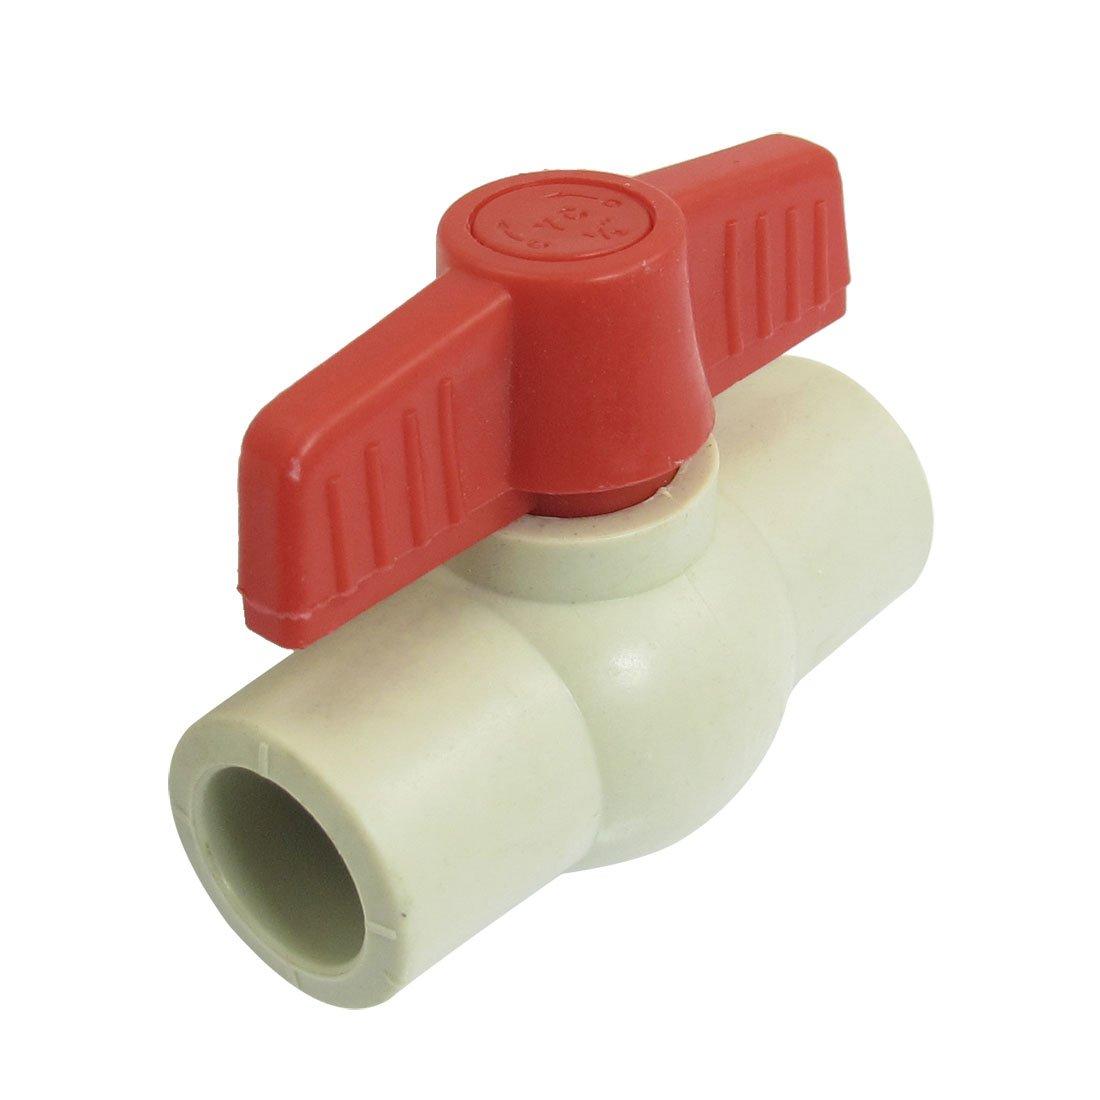 19mm x 19mm Slip Red Handle Plumbing PPR Ball Valve Light Gray sourcingmap